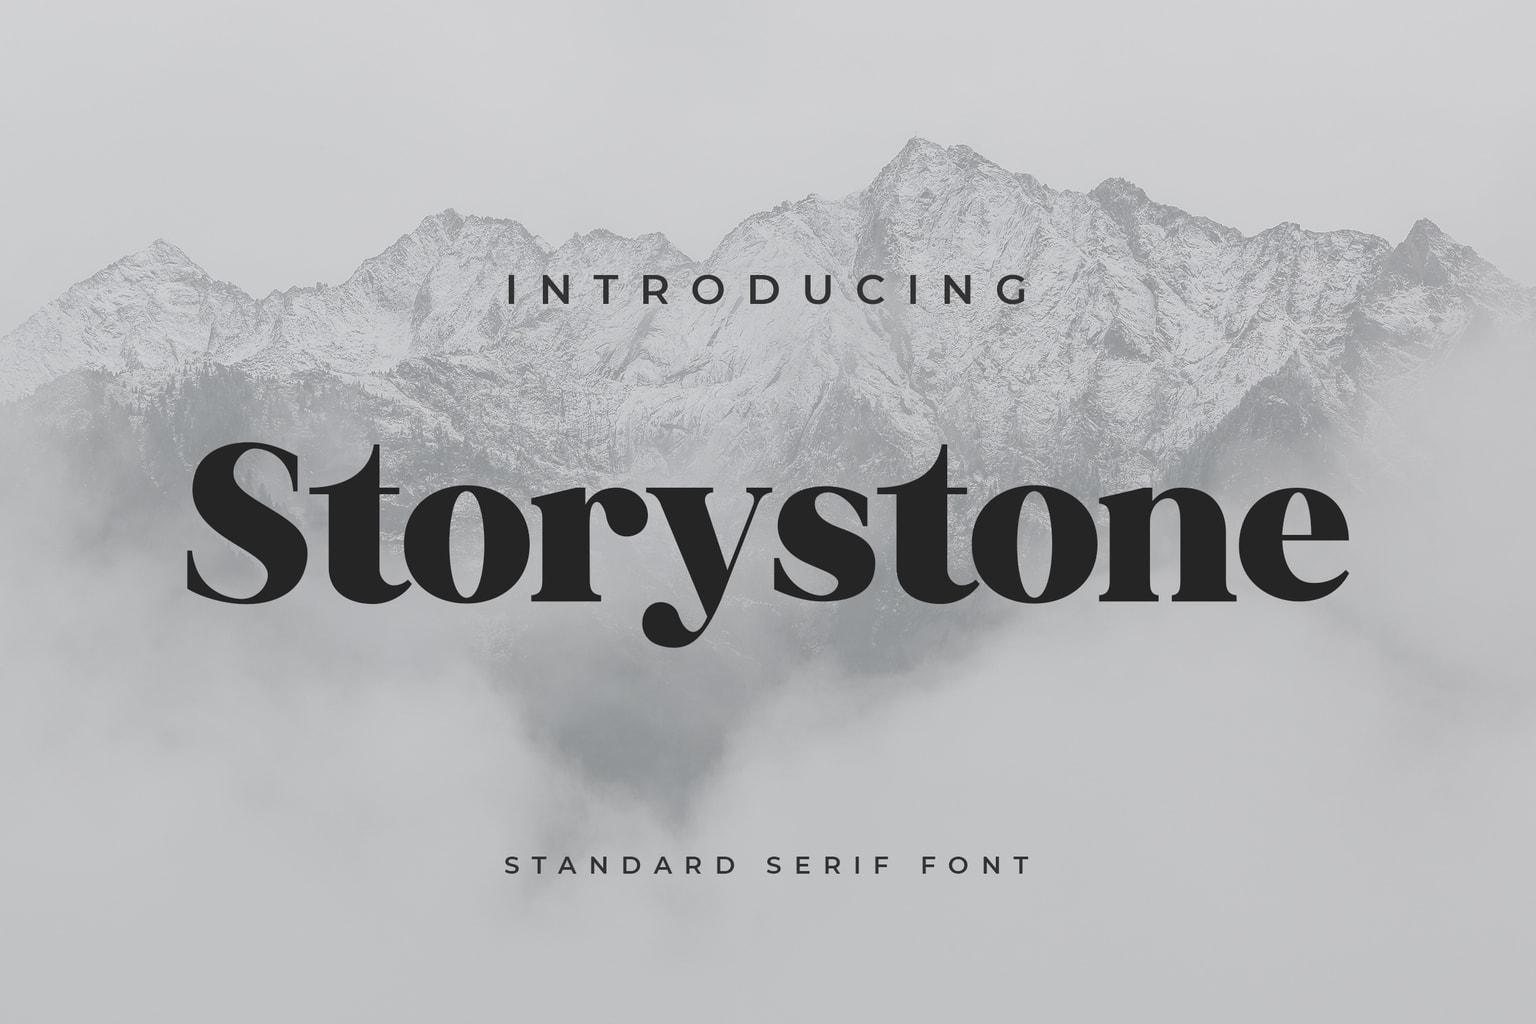 fonts storystone serif